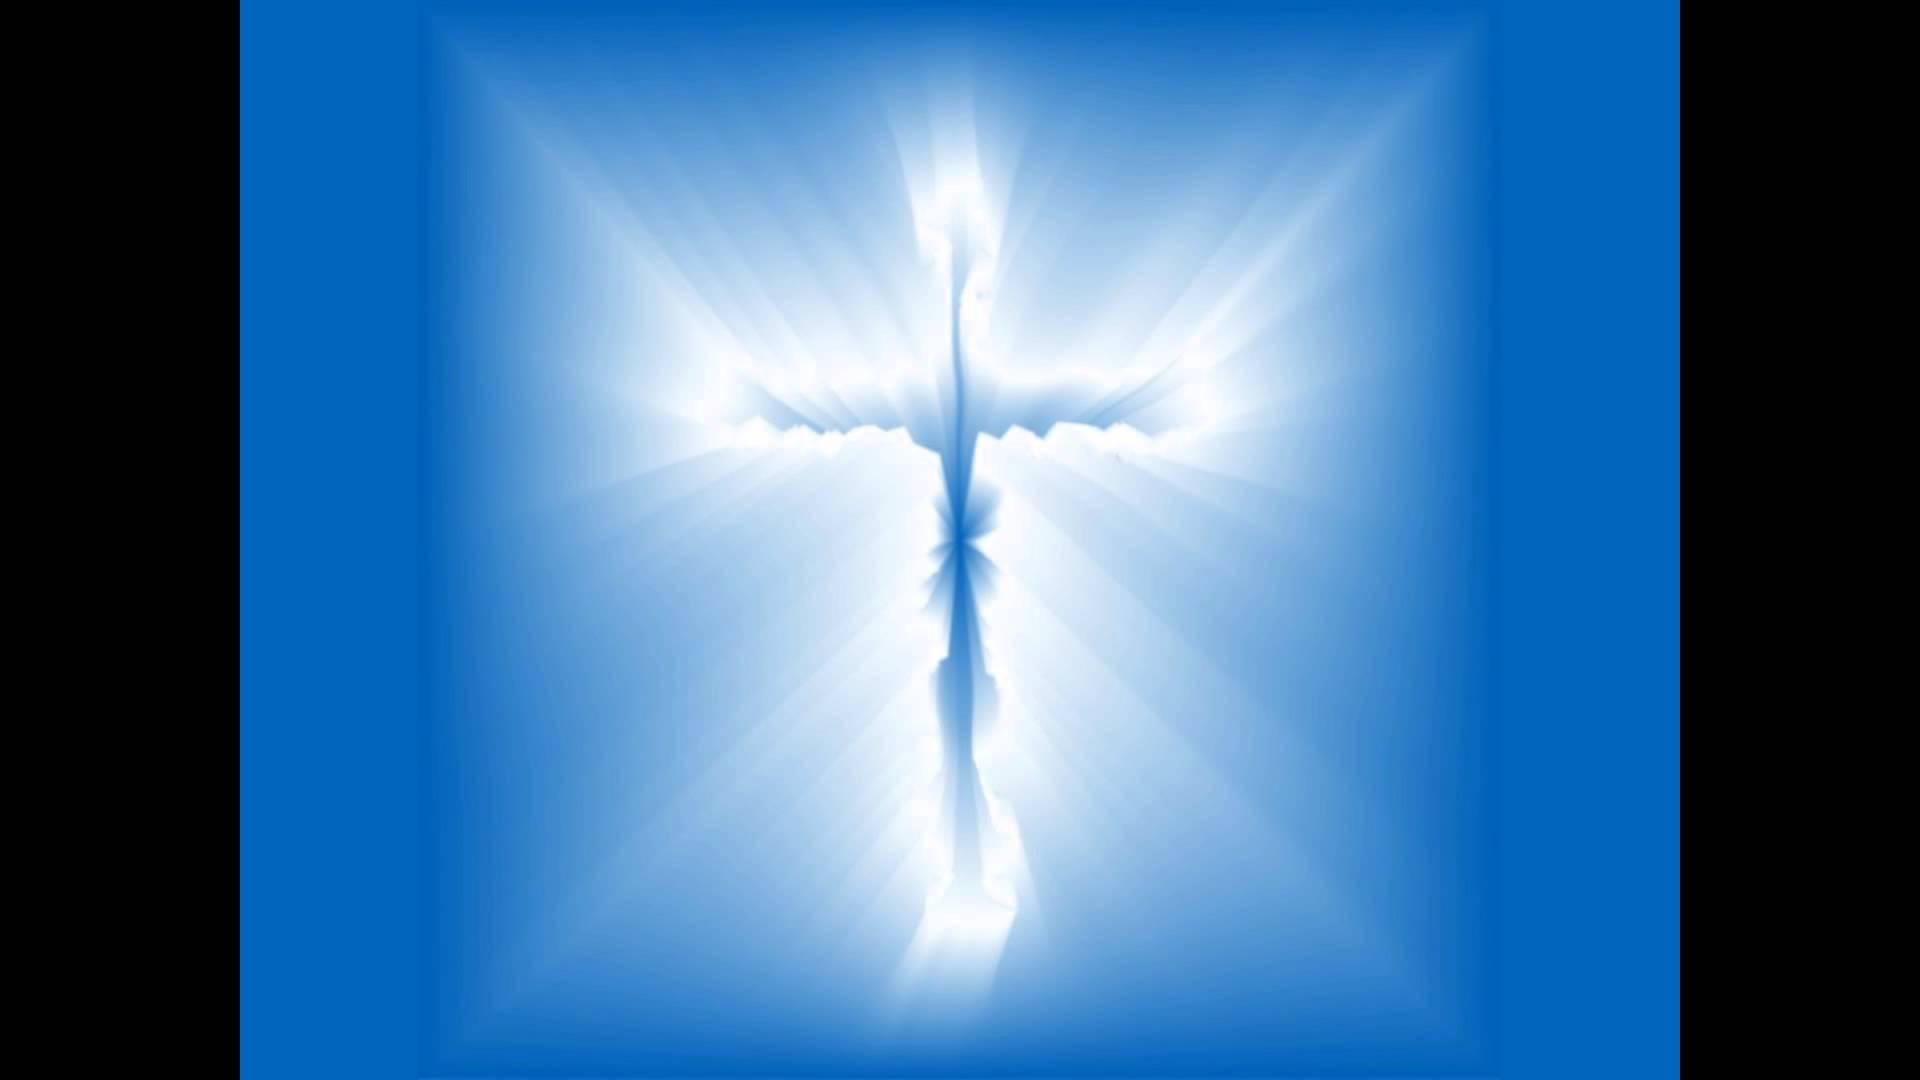 Opwekking 638 - Prijs Adonai 4